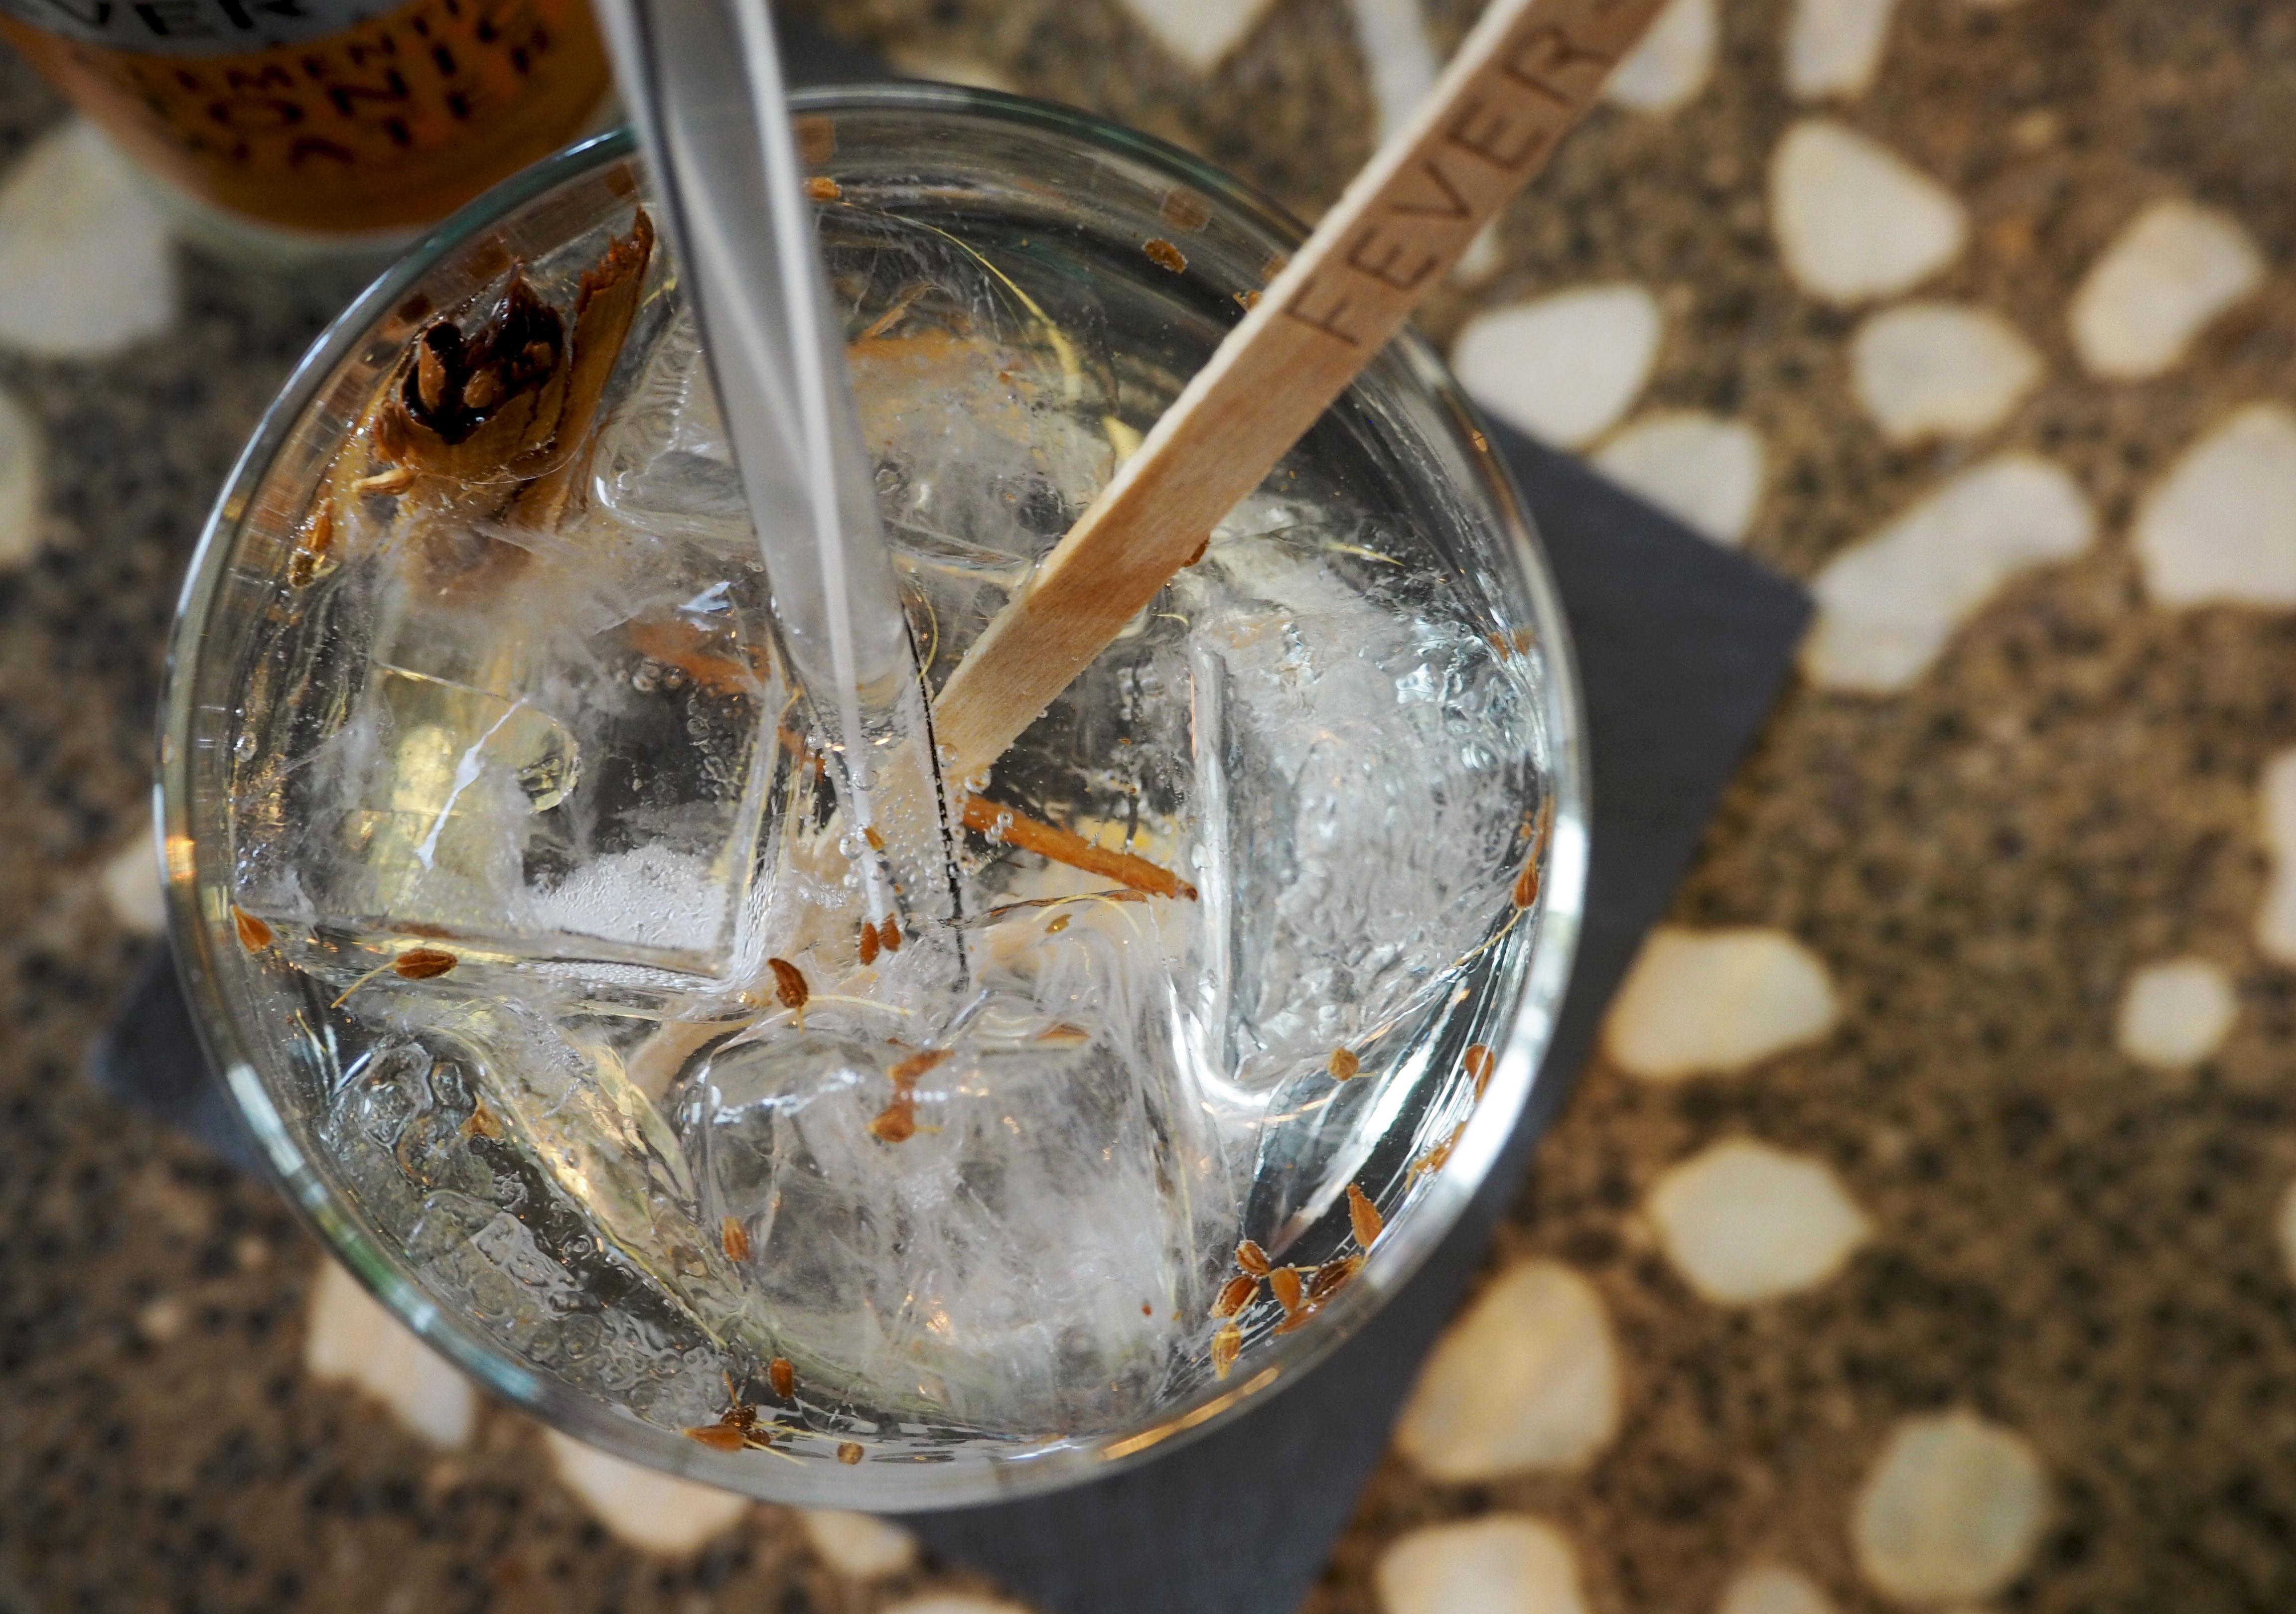 skully tangerine gin tonic